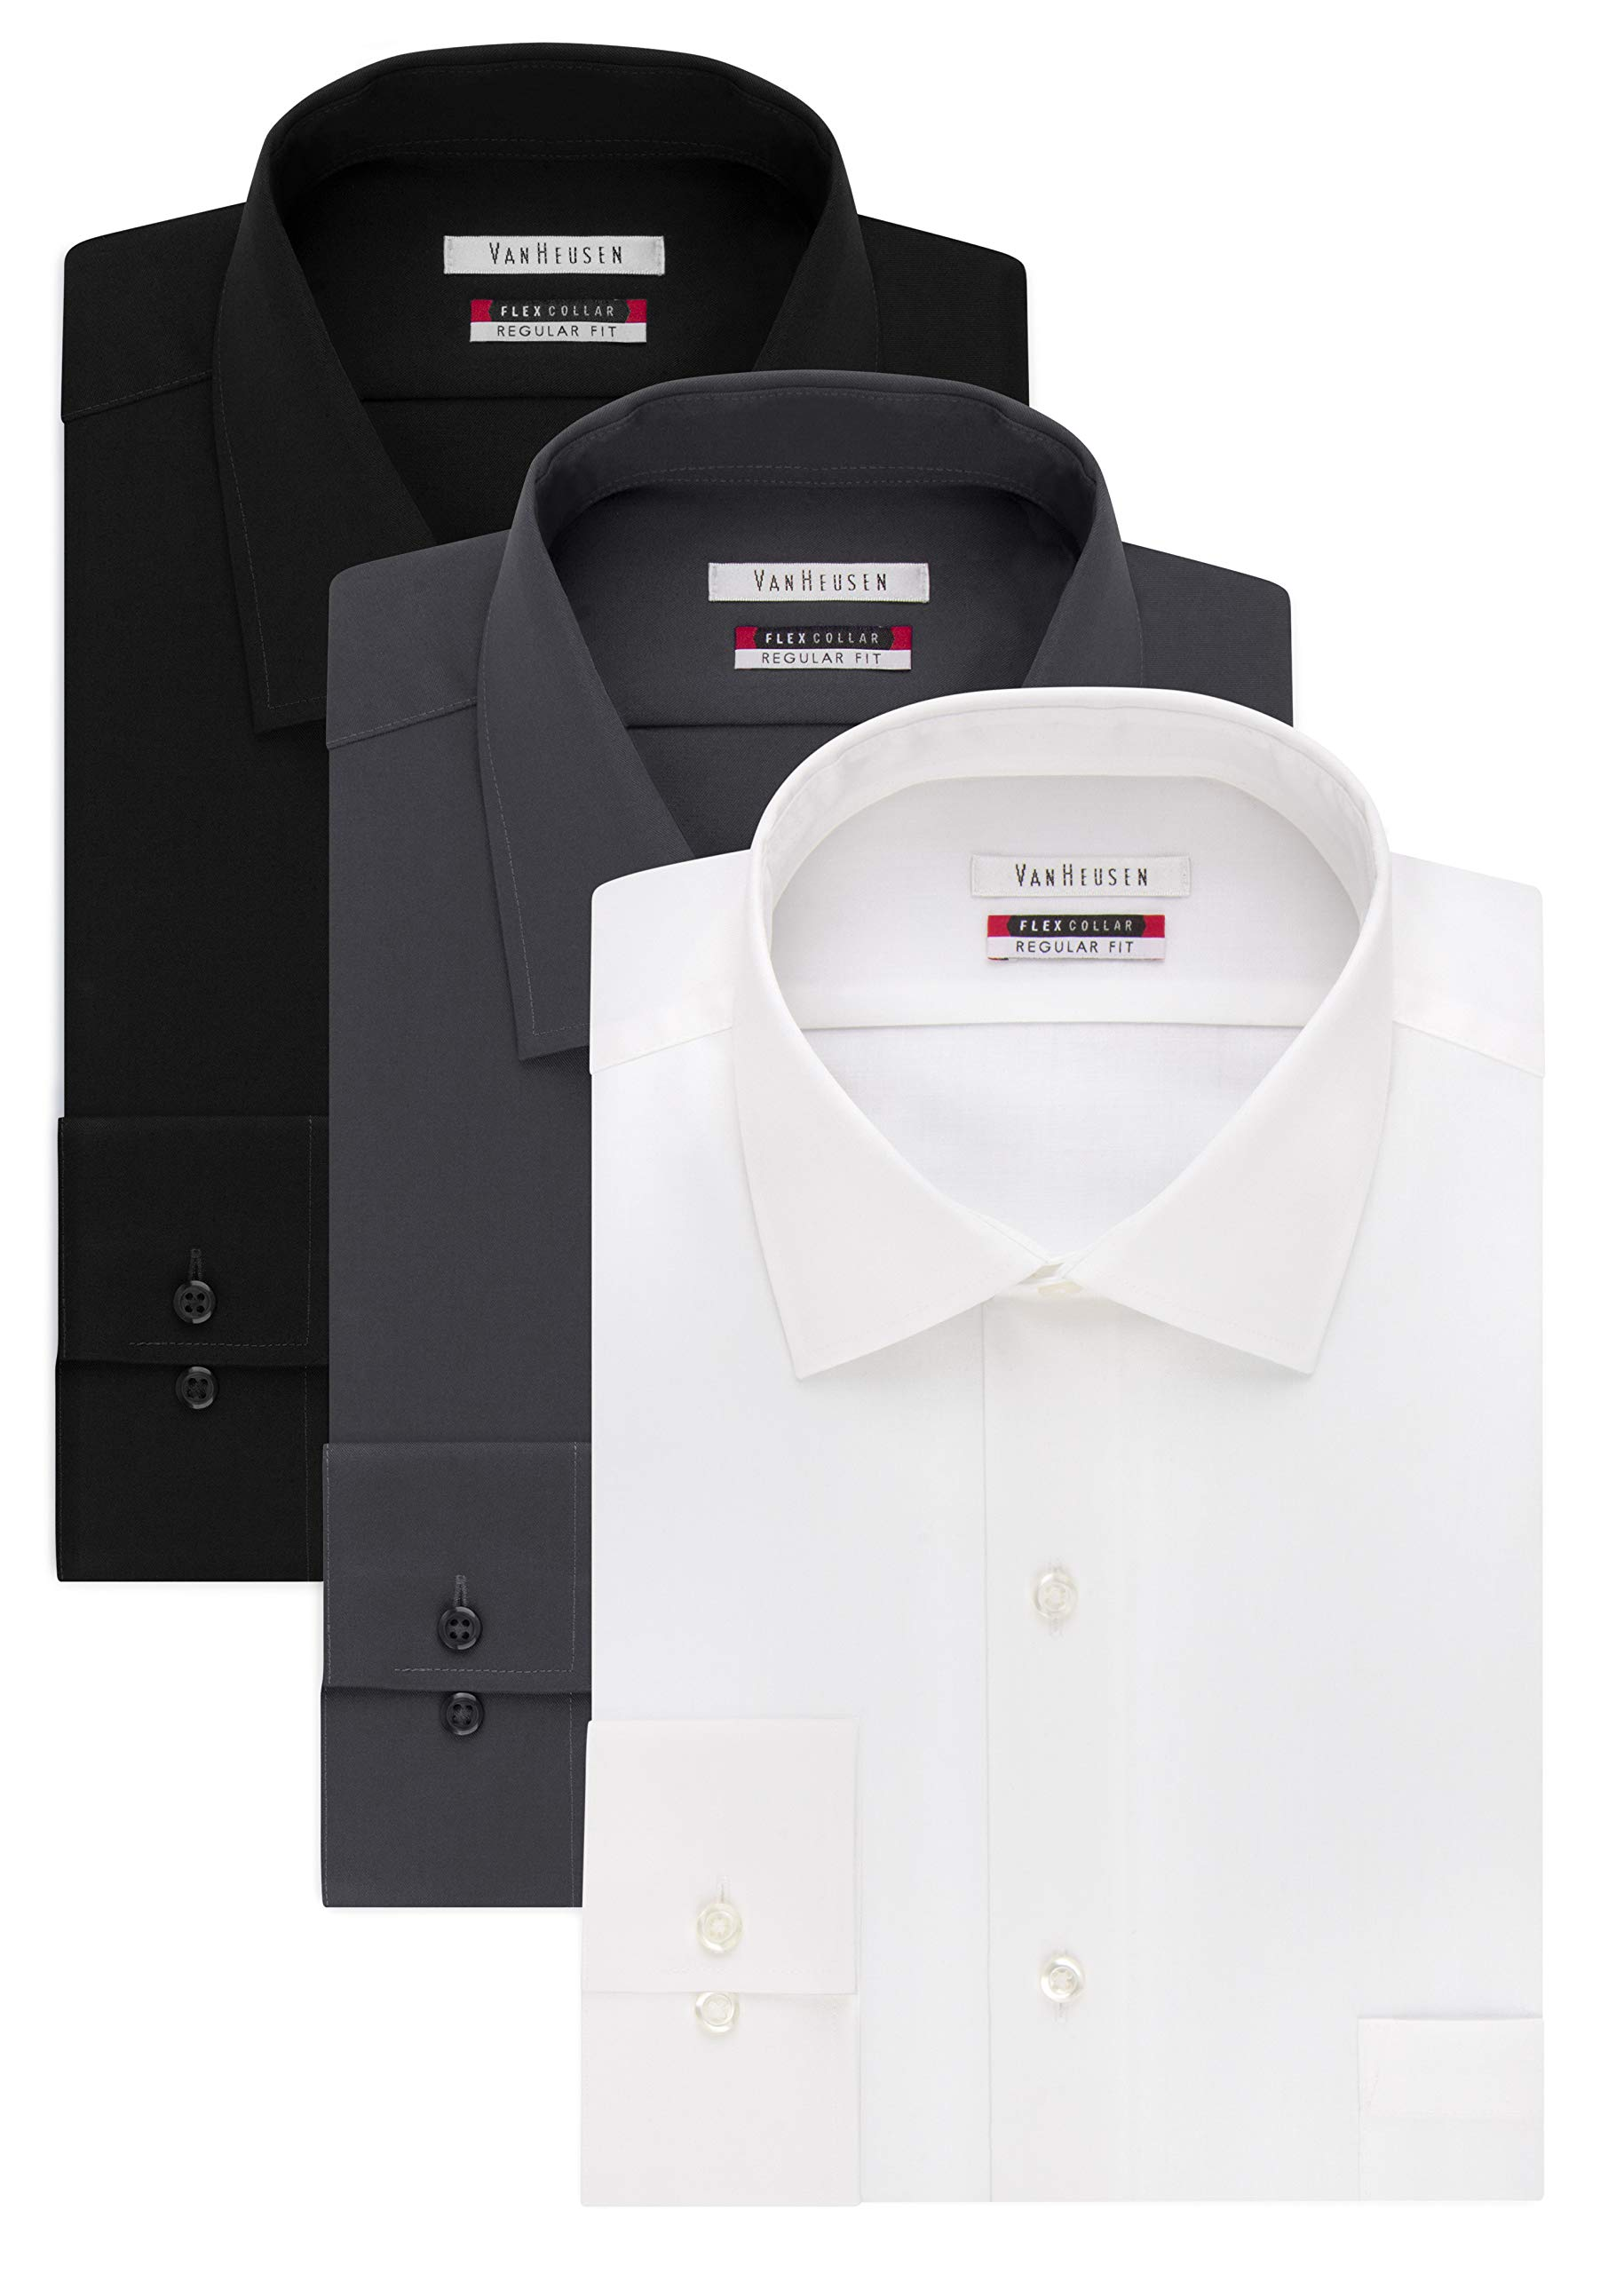 Van Heusen Men's Flex Collar Regular Fit Solid Spread Collar Dress Shirt, White/Black/Charcoal, 18.5'' Neck 34''-35'' Sleeve